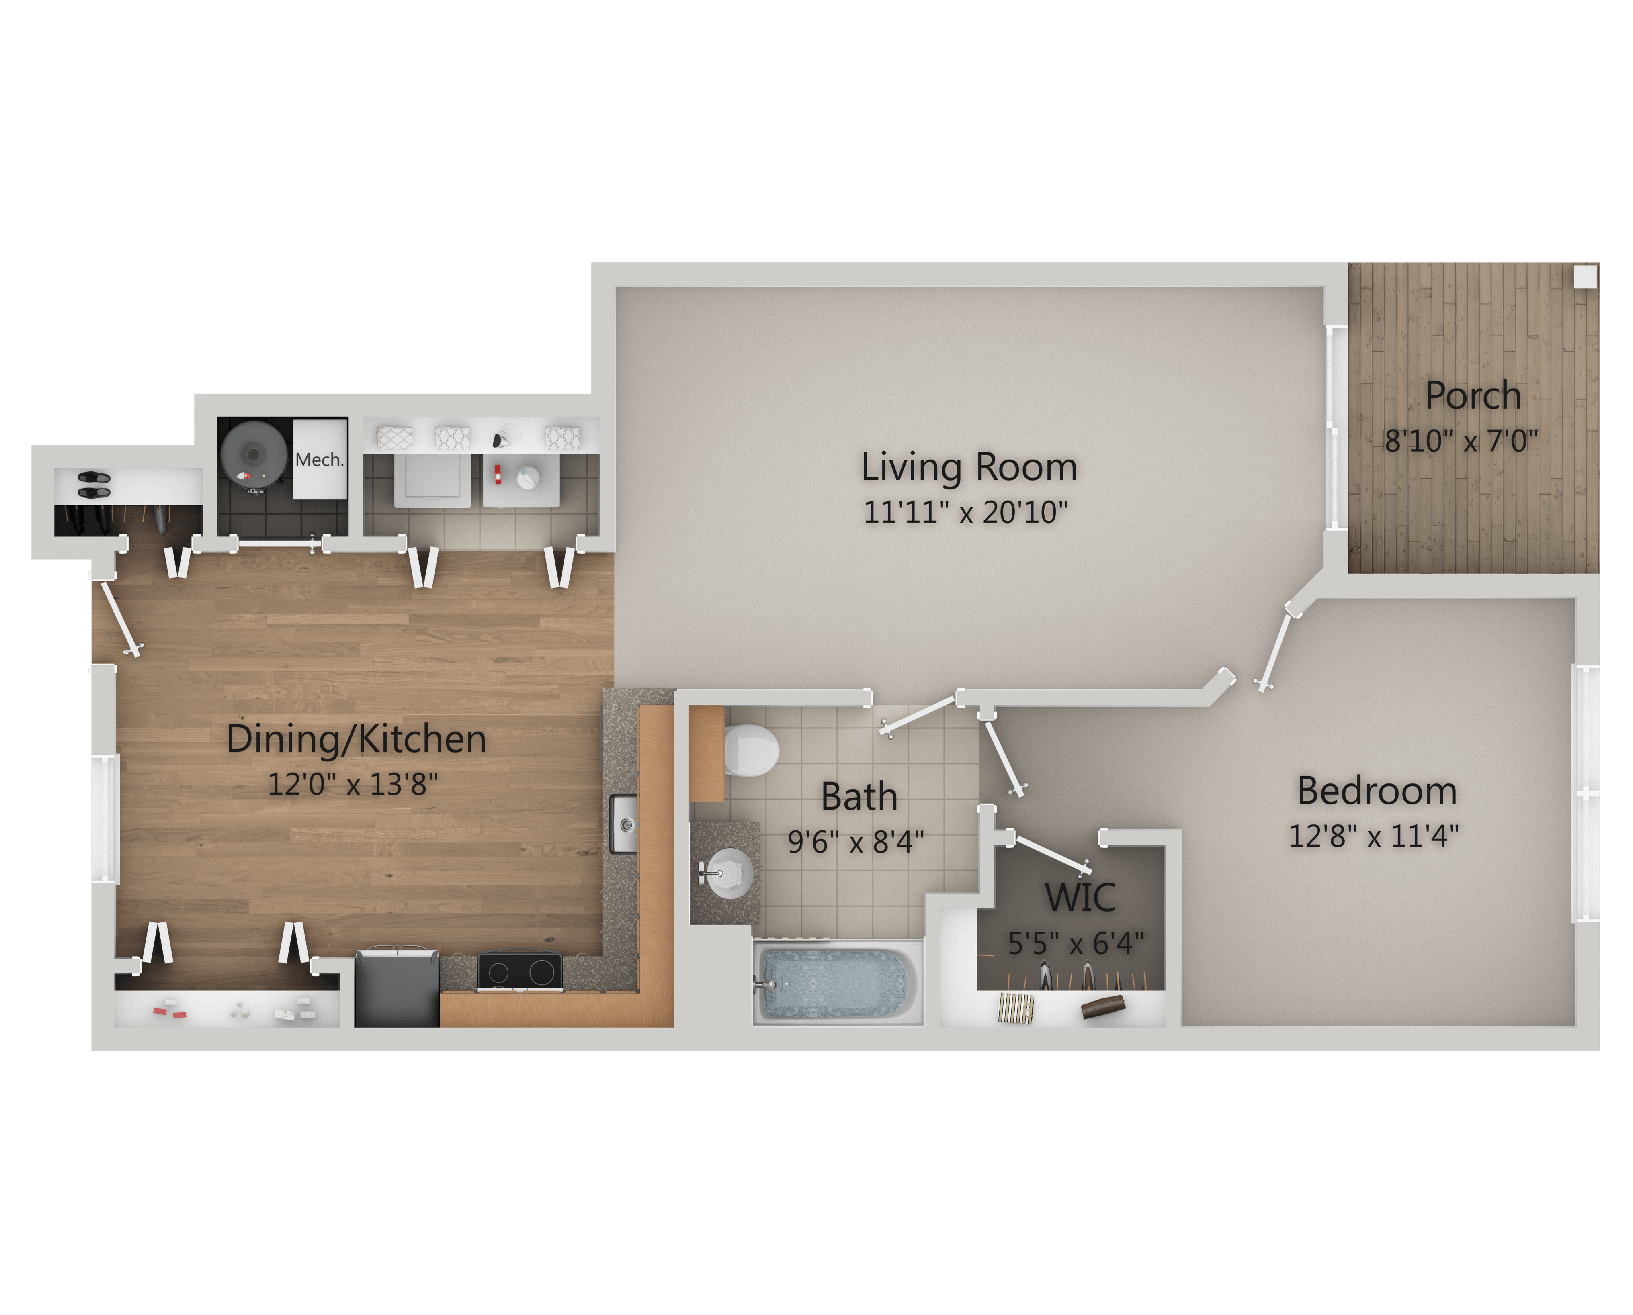 Hudson Preserve - Mohawk 1 Bed, 1 Bath